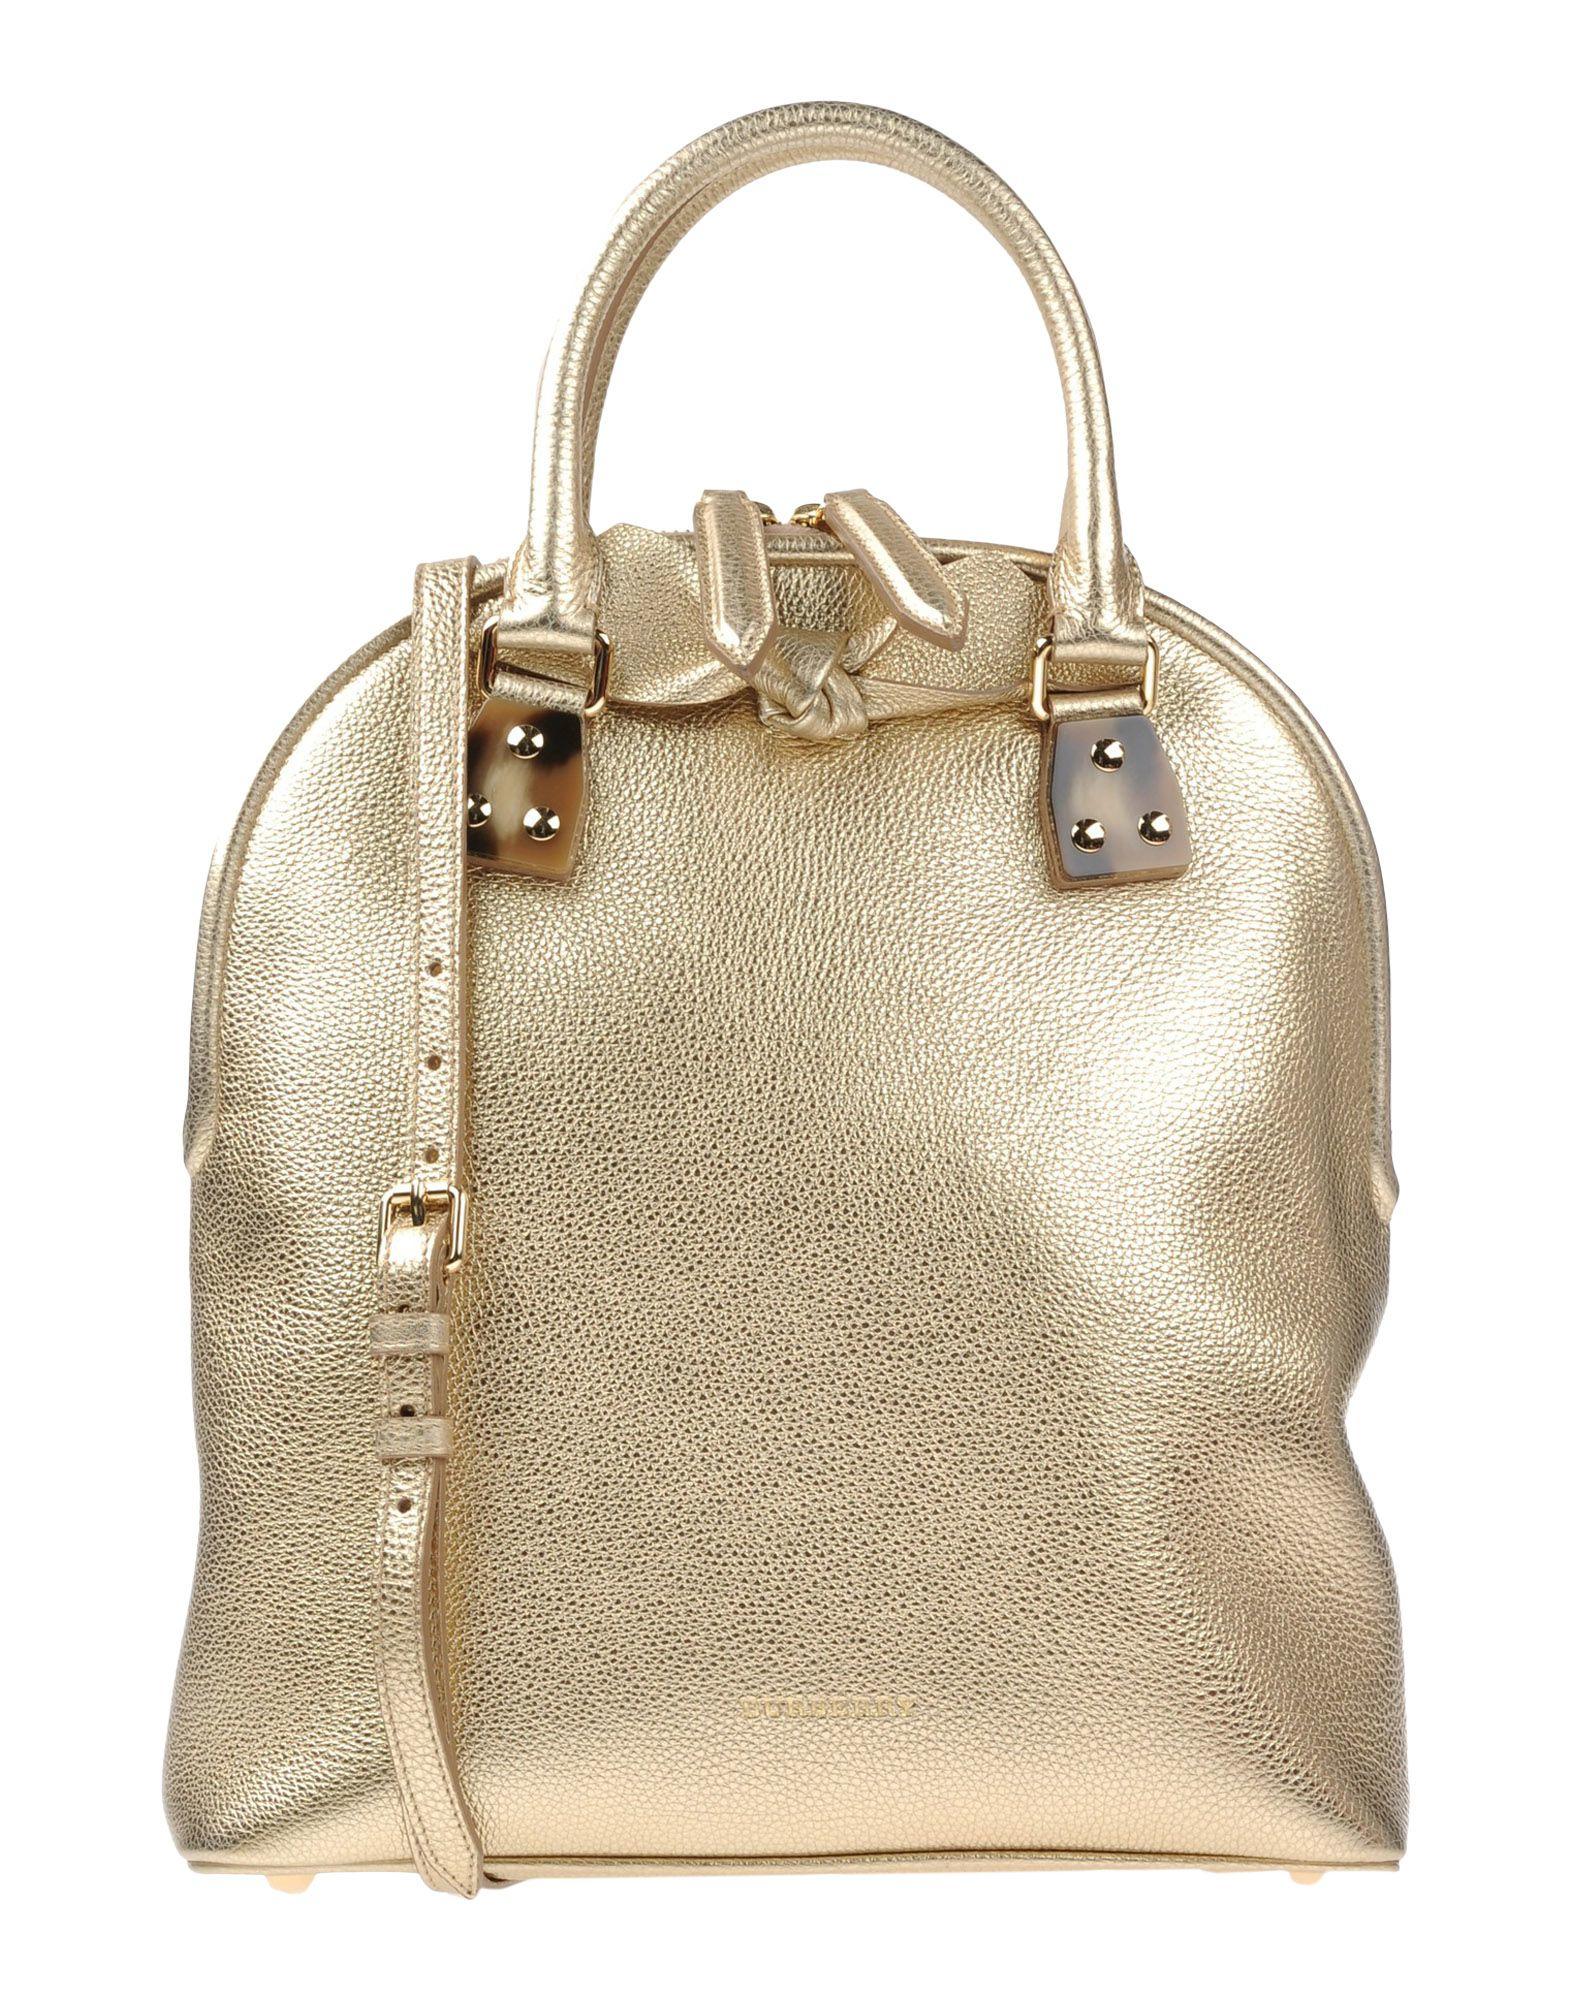 burberry handbag in metallic lyst. Black Bedroom Furniture Sets. Home Design Ideas